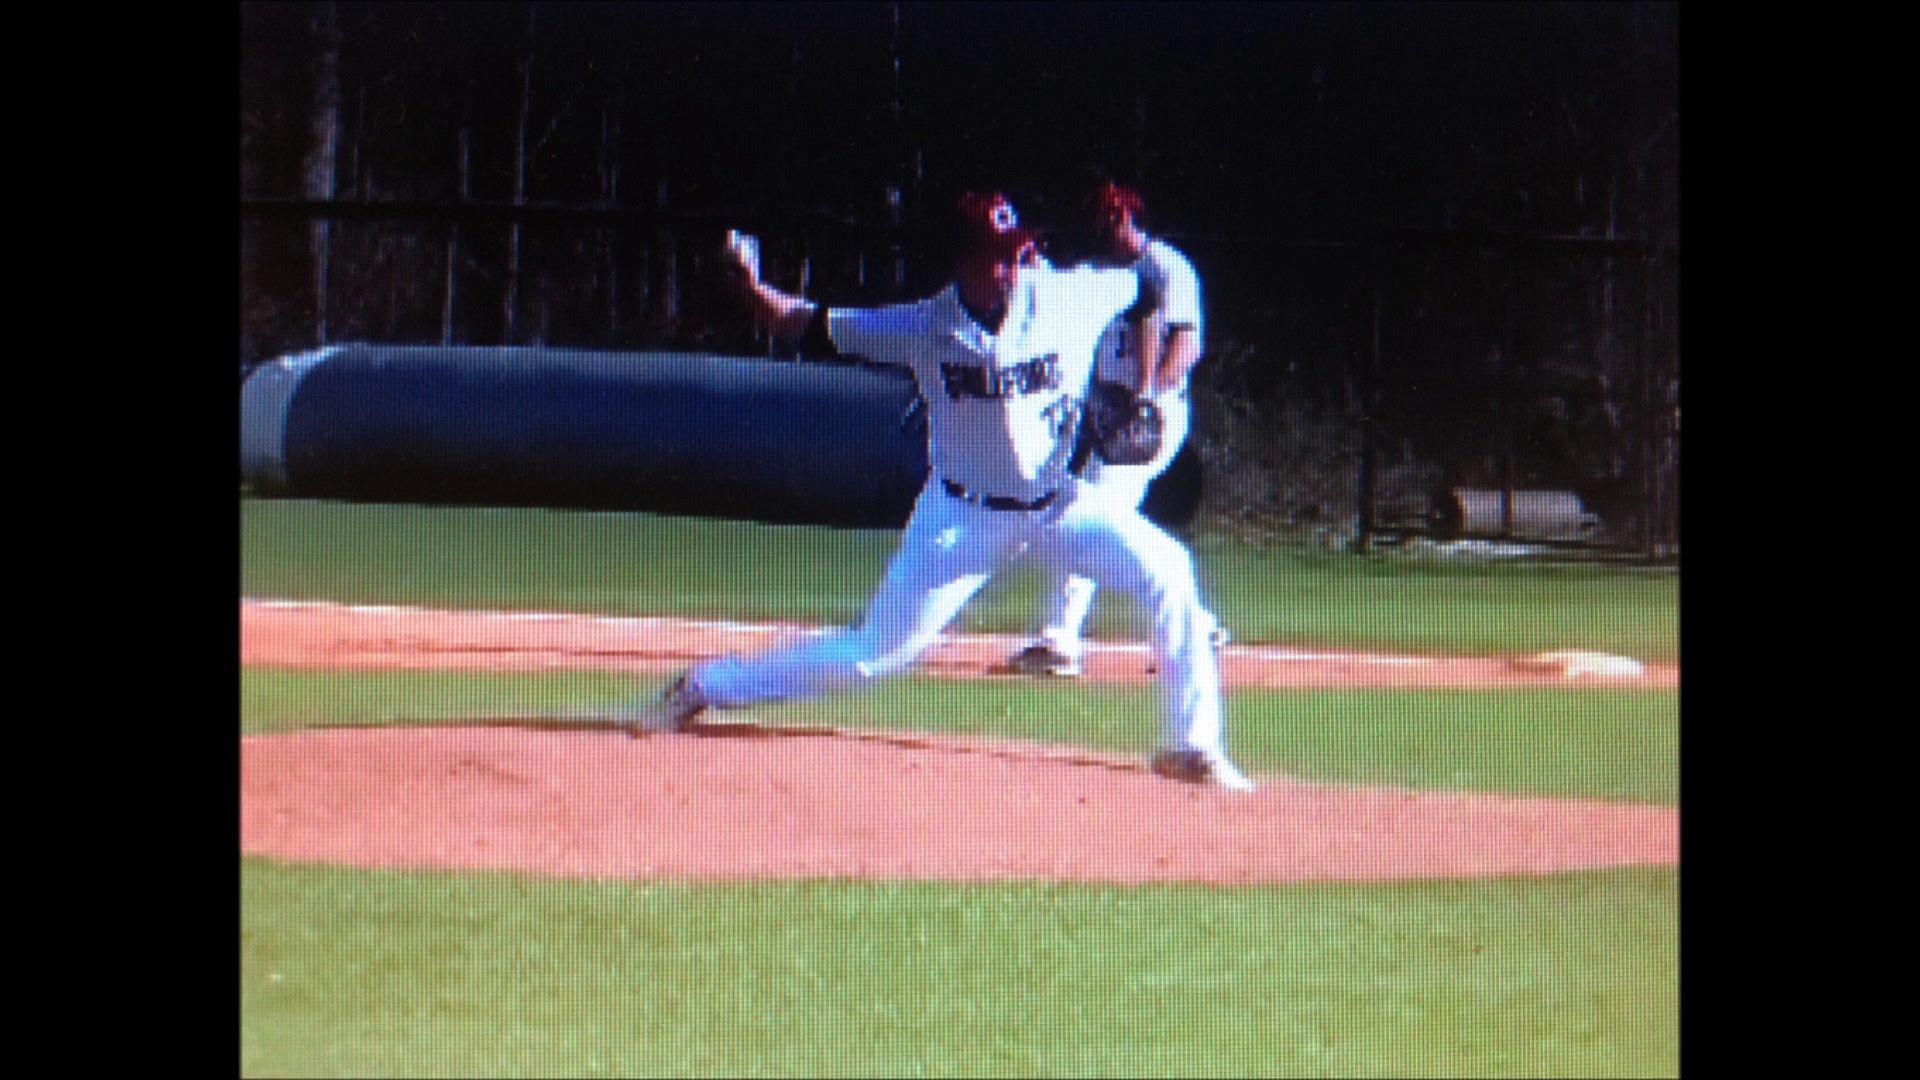 Joe LeNoir – Guilford College Baseball (3.23.15)